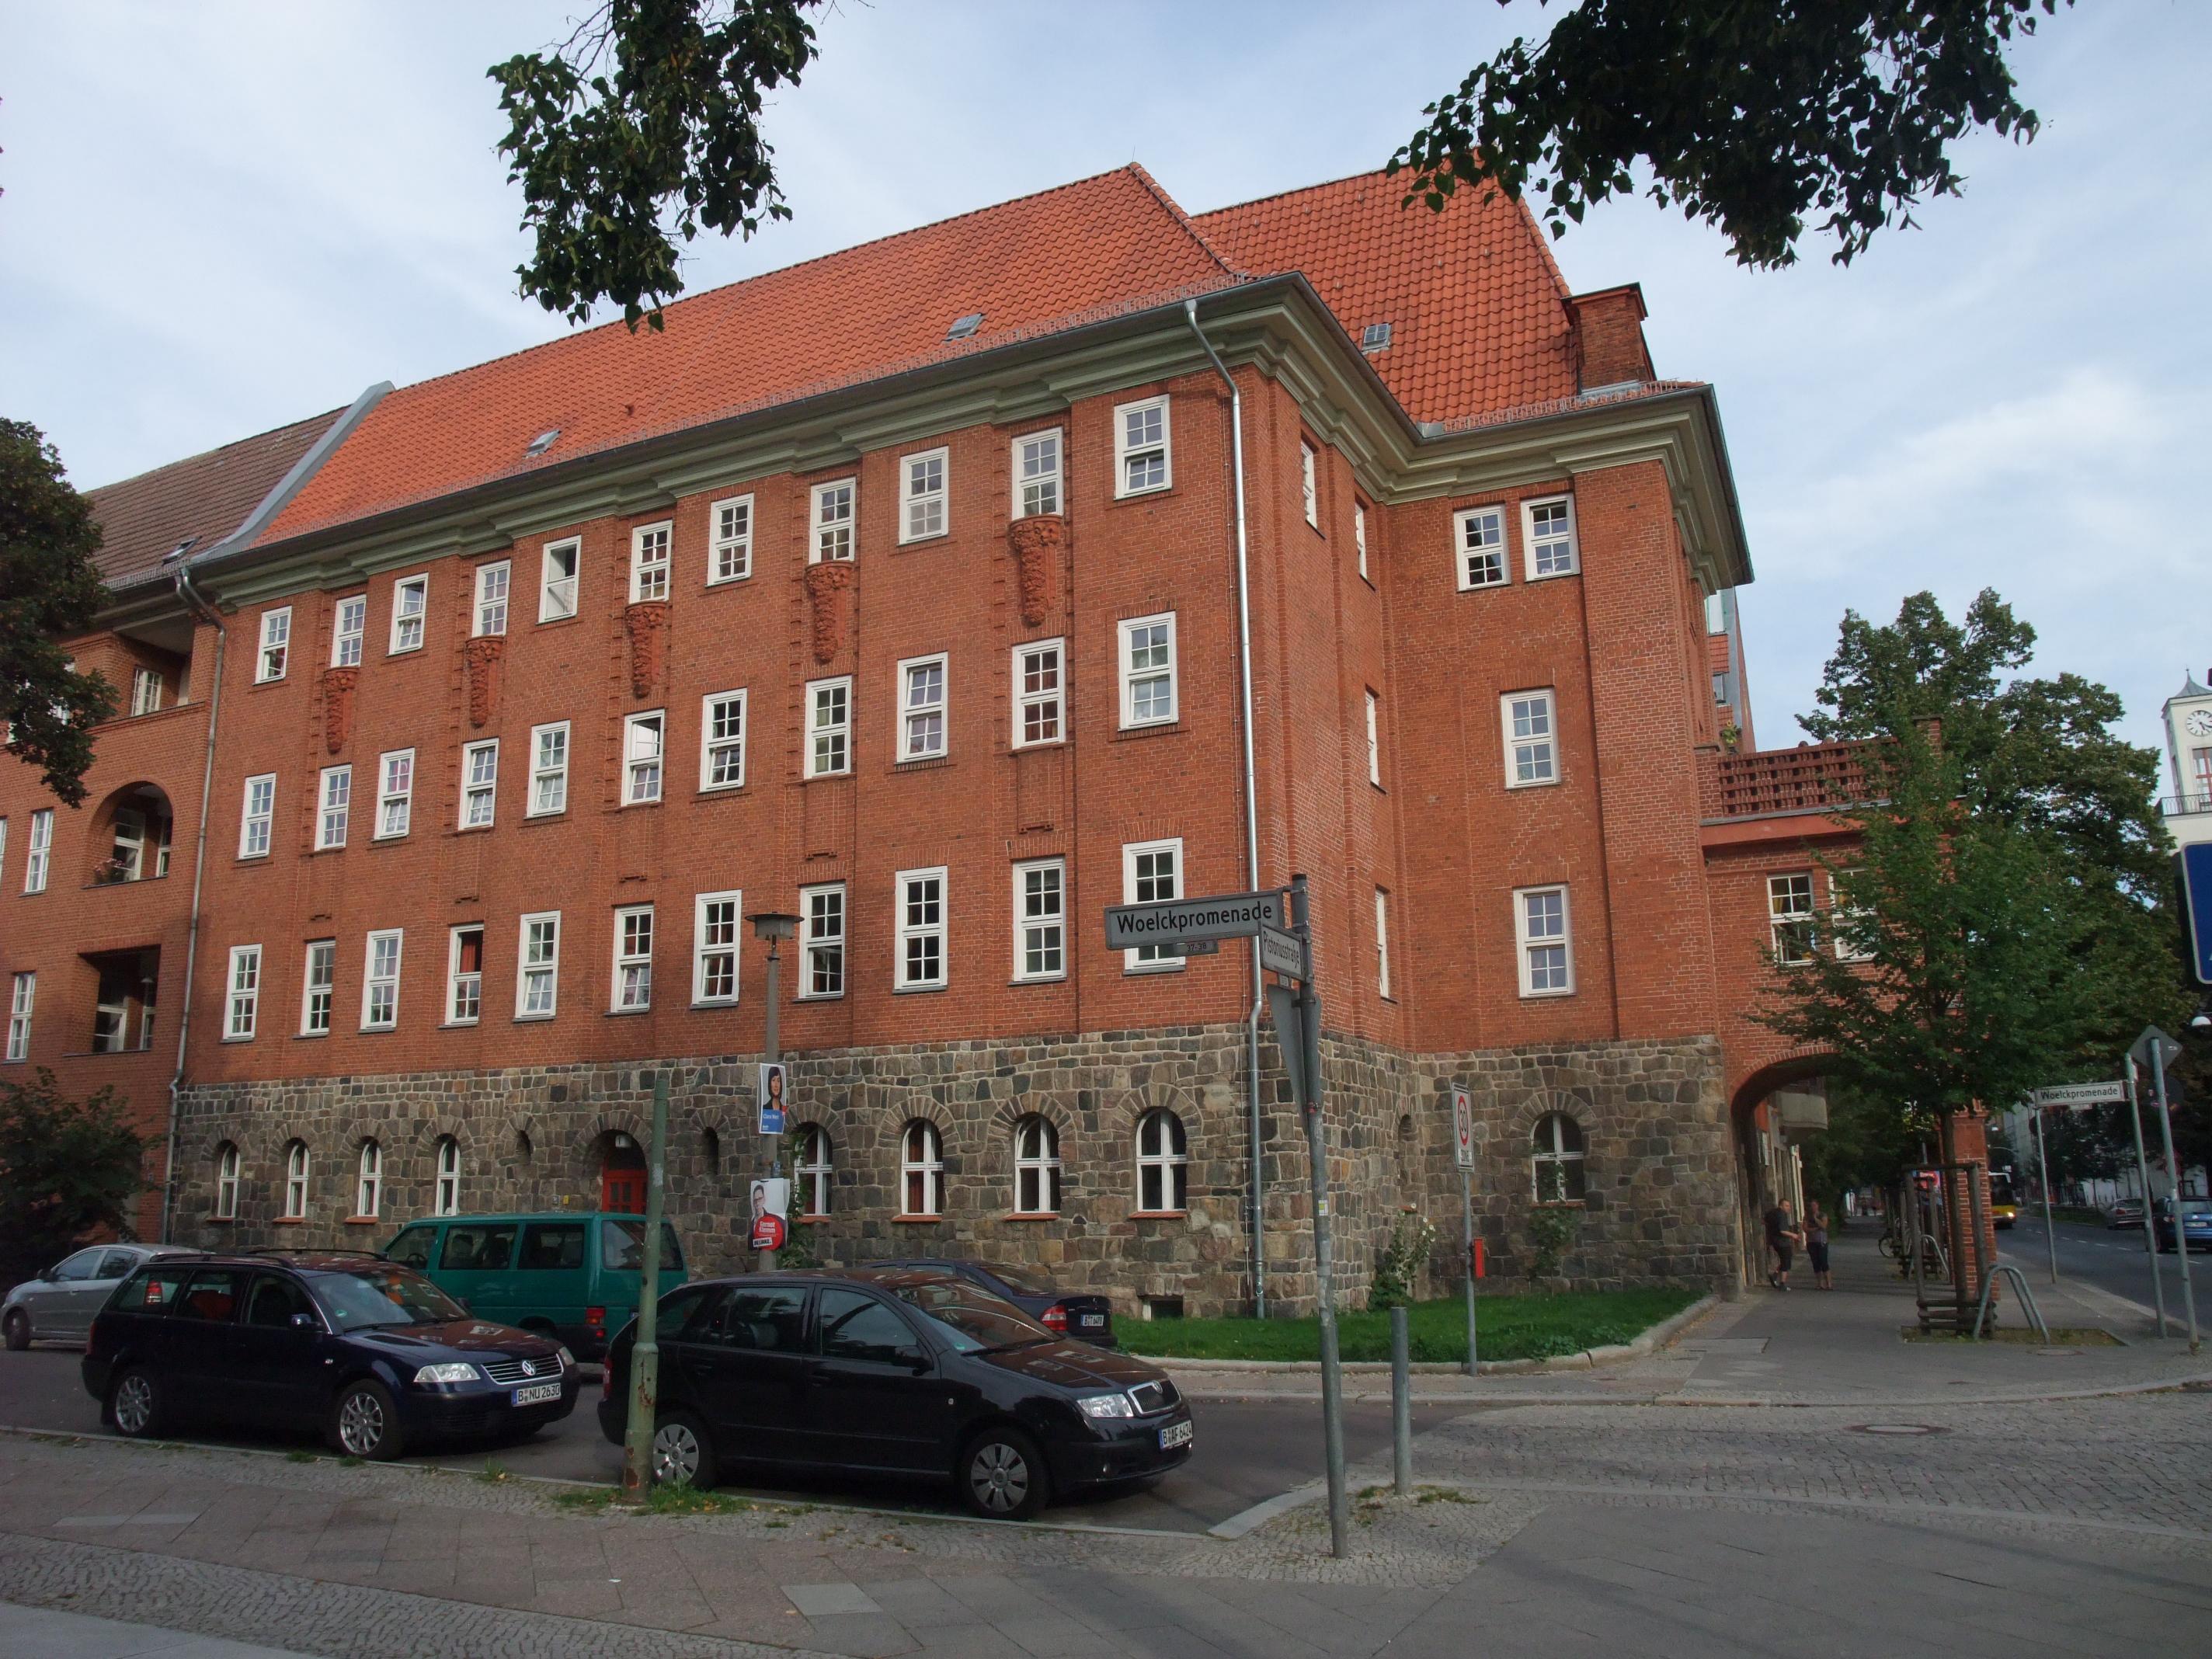 file berlin weissensee pistoriusstrasse 17 ledigenwohnheim view from sw jpg wikimedia commons. Black Bedroom Furniture Sets. Home Design Ideas